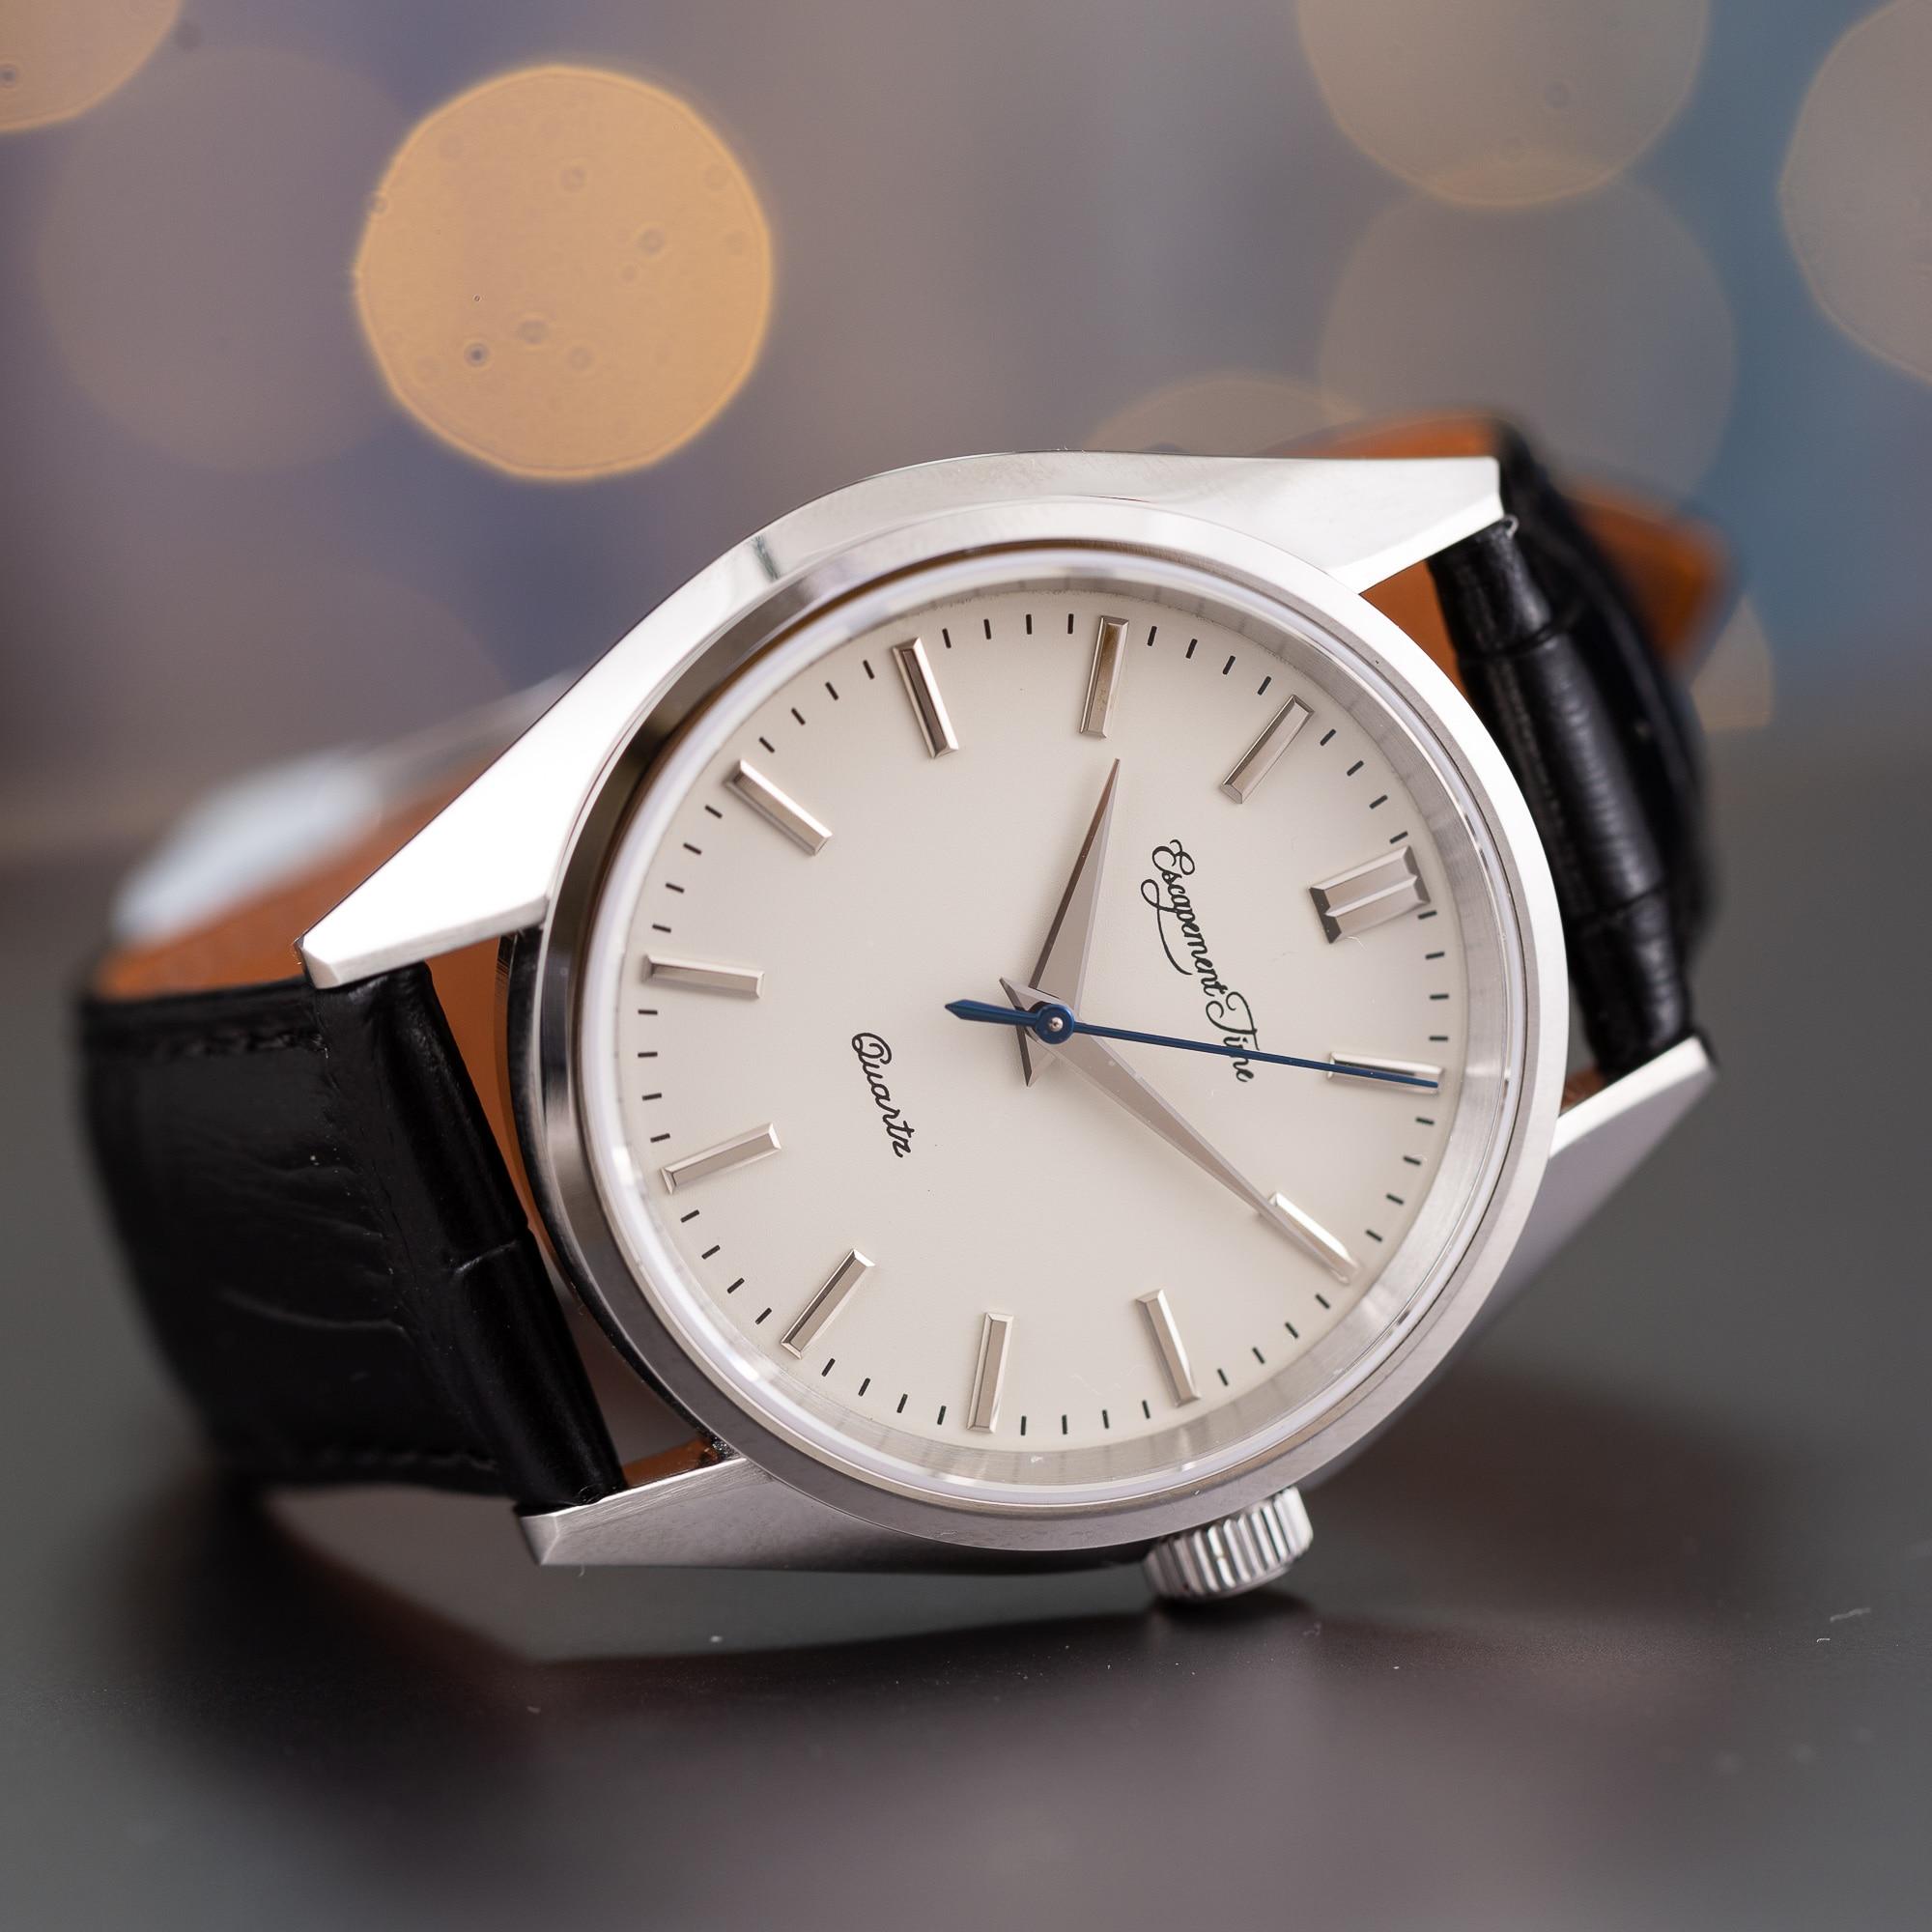 [Время выхода] кварцевые часы 40 мм чехол VH31 с термообработкой рук